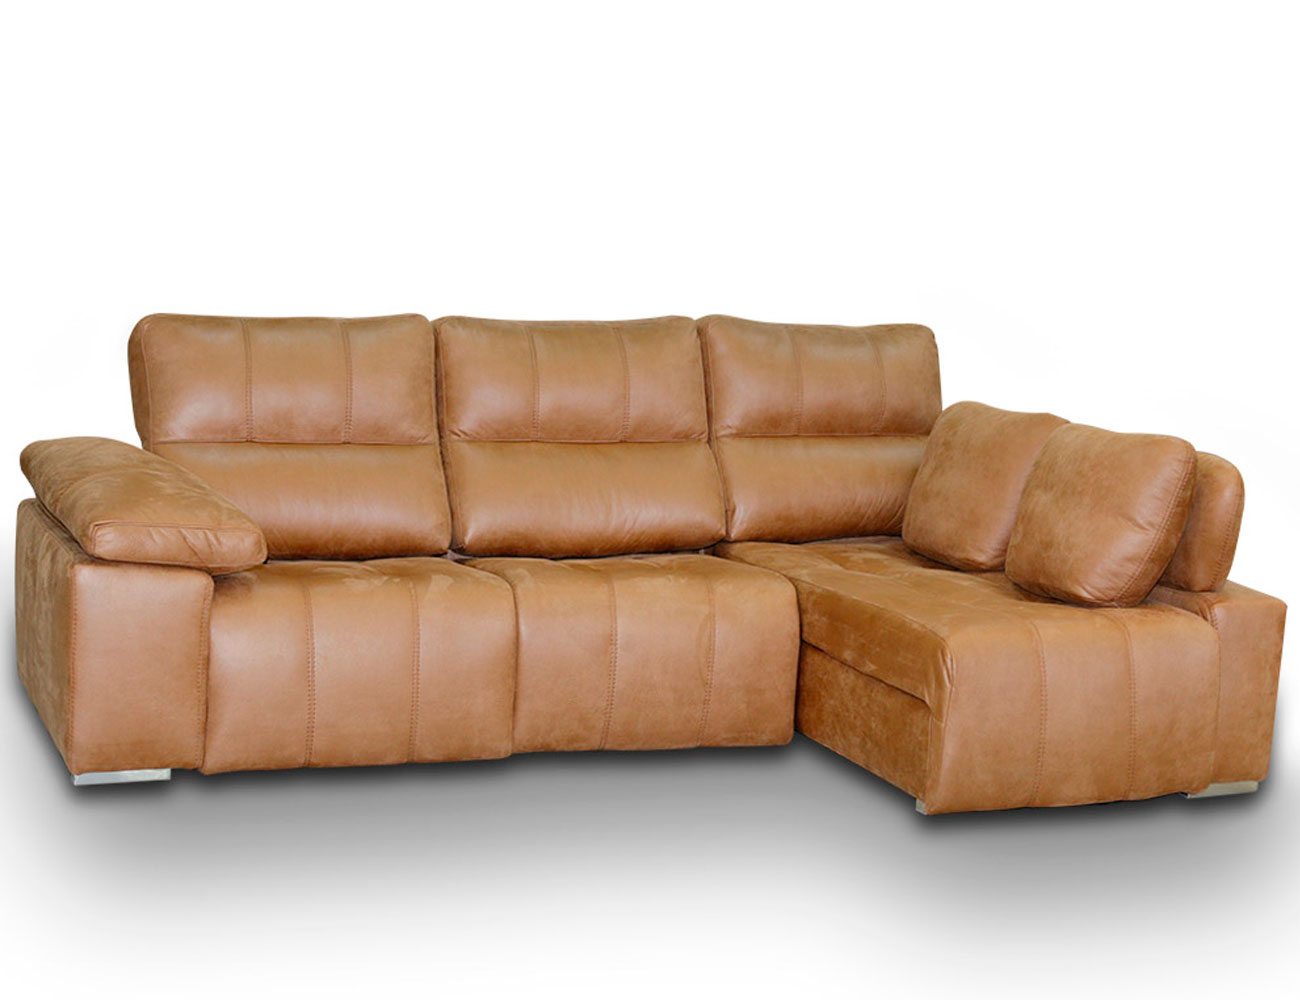 Sofa chaiselongue relax 2 motores anti manchas53